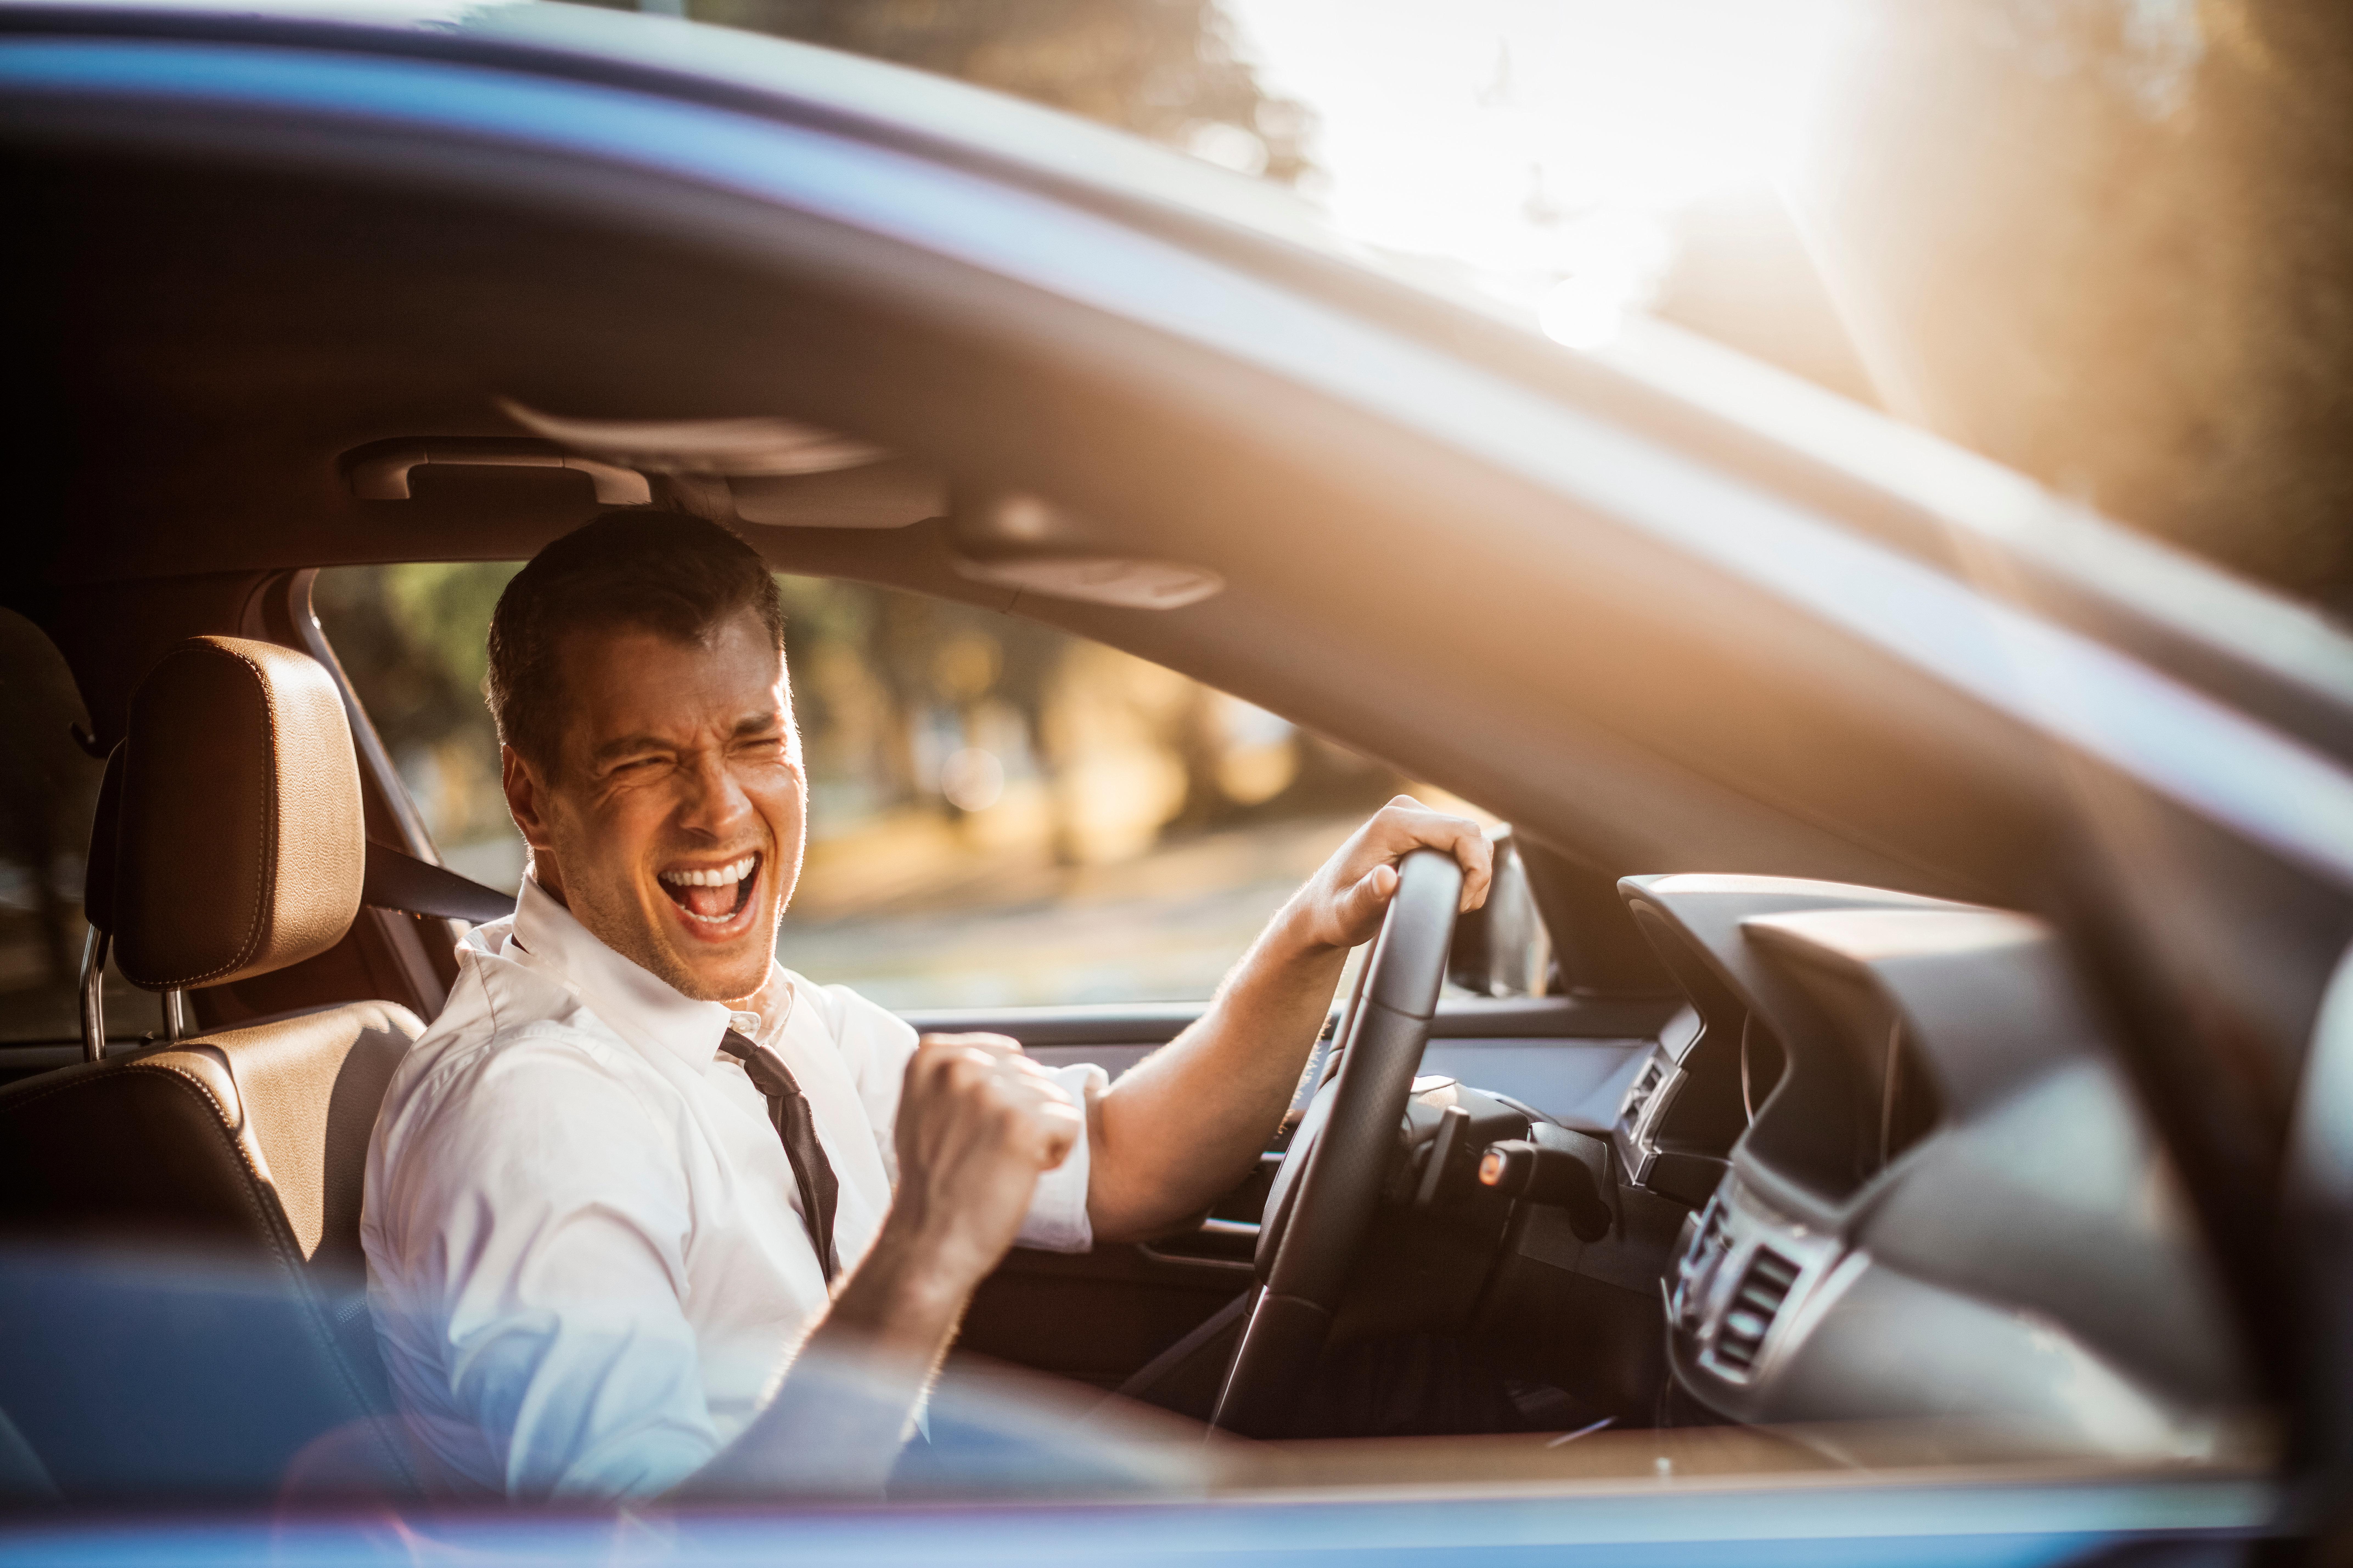 Close up photo of a businessman driving a car